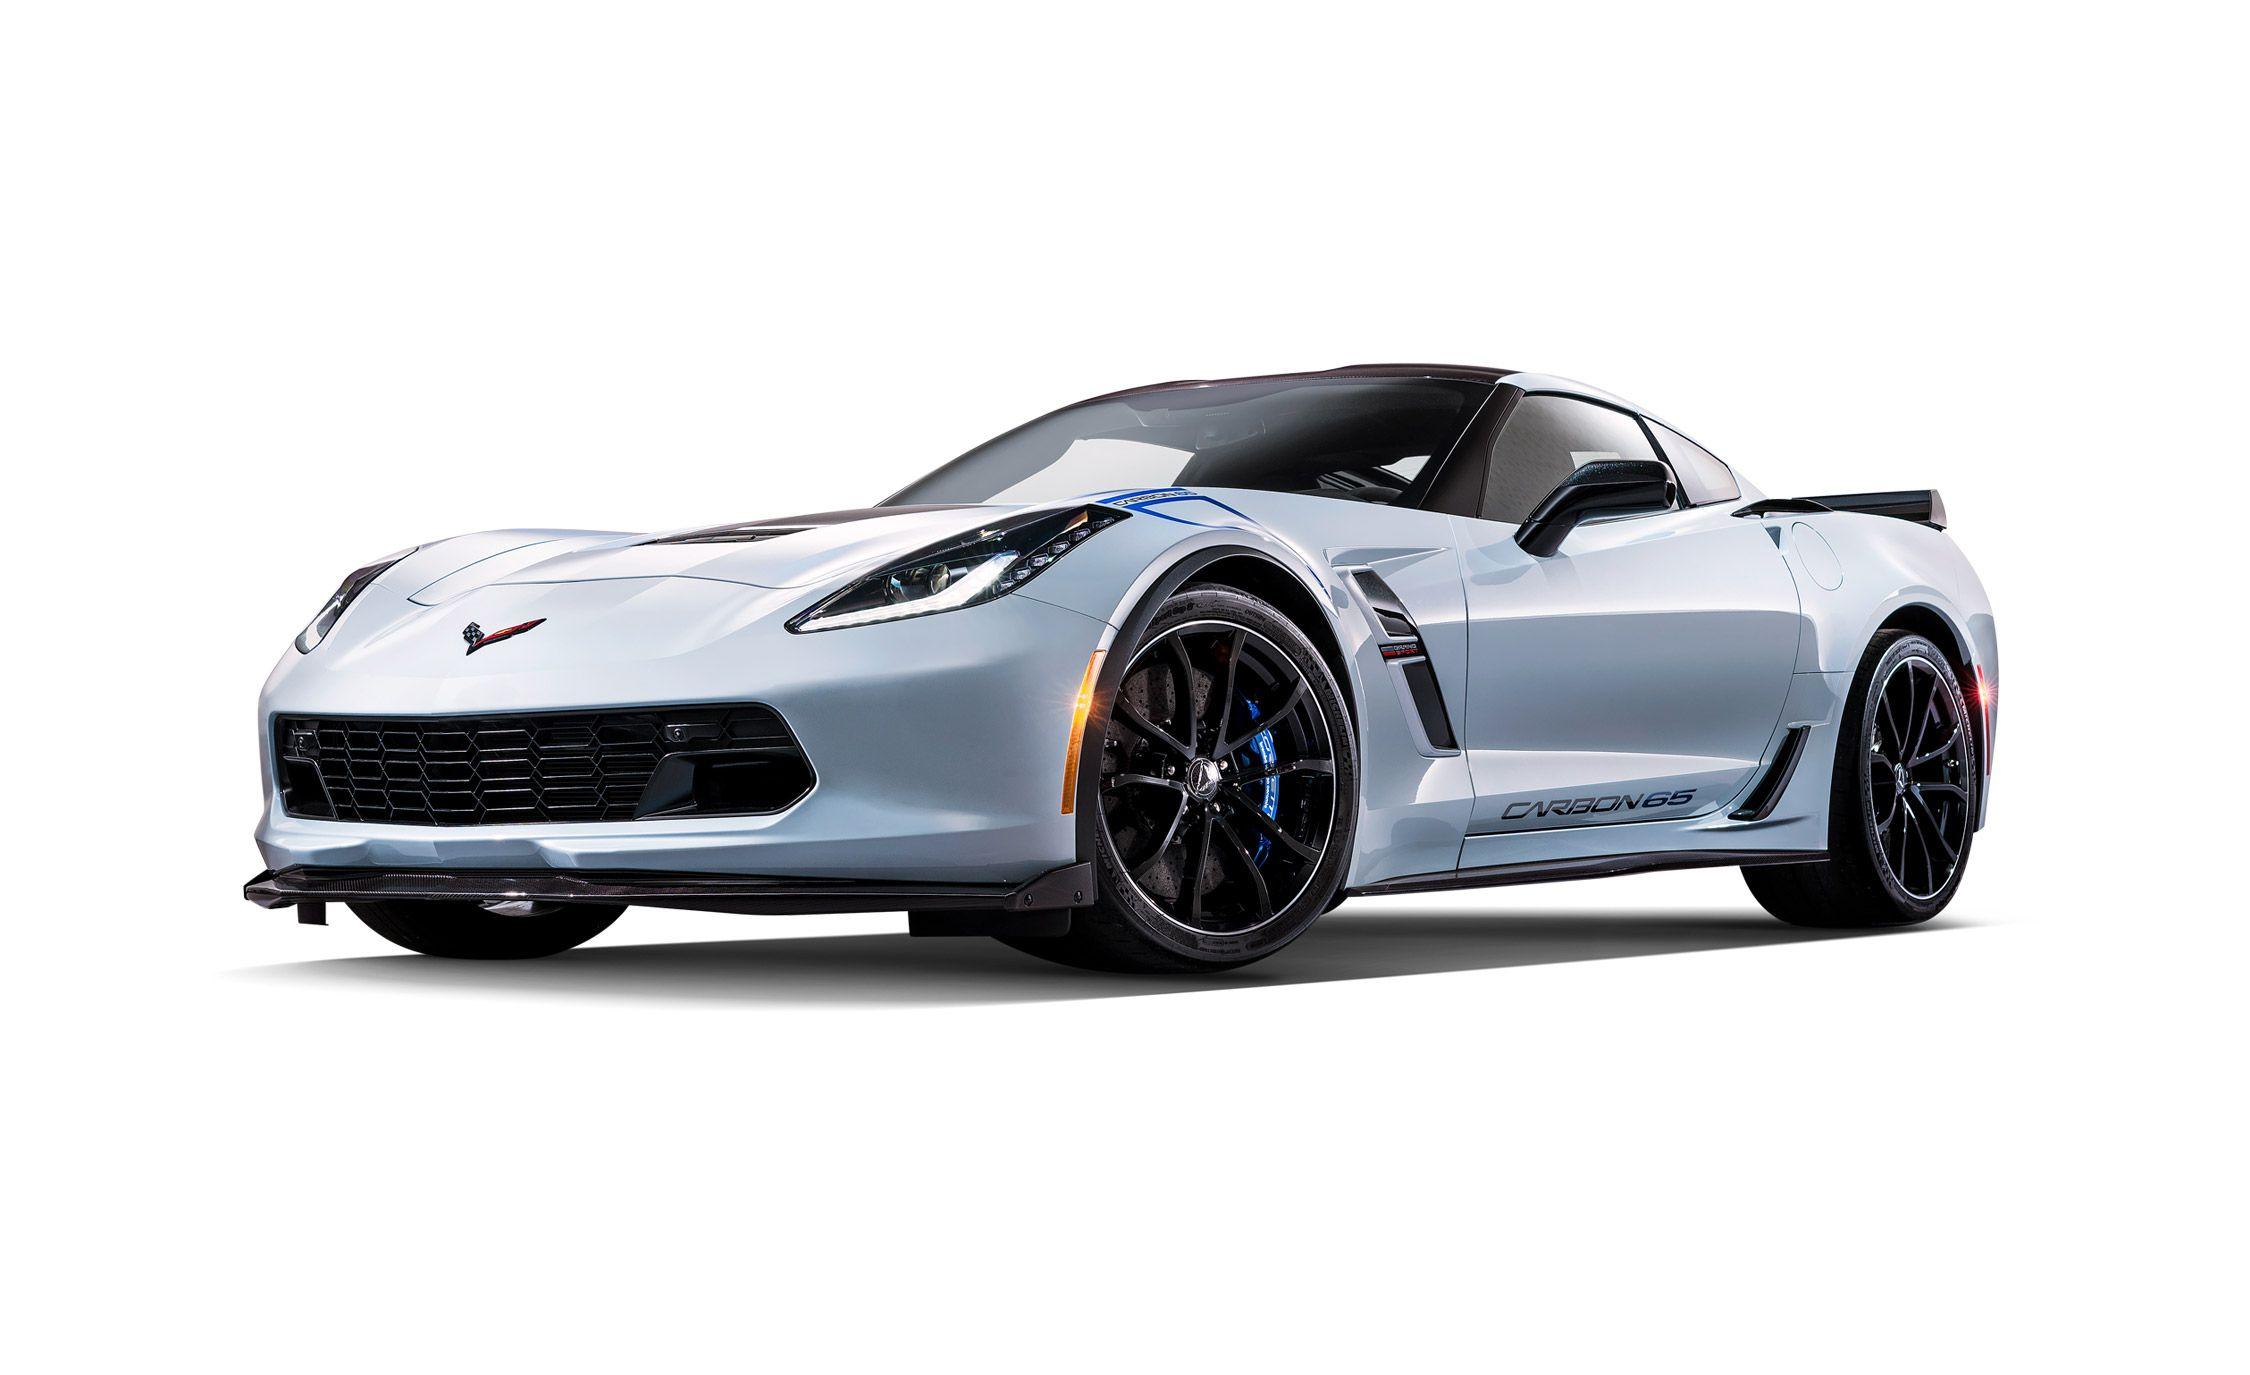 New Cars for 2018: Chevrolet